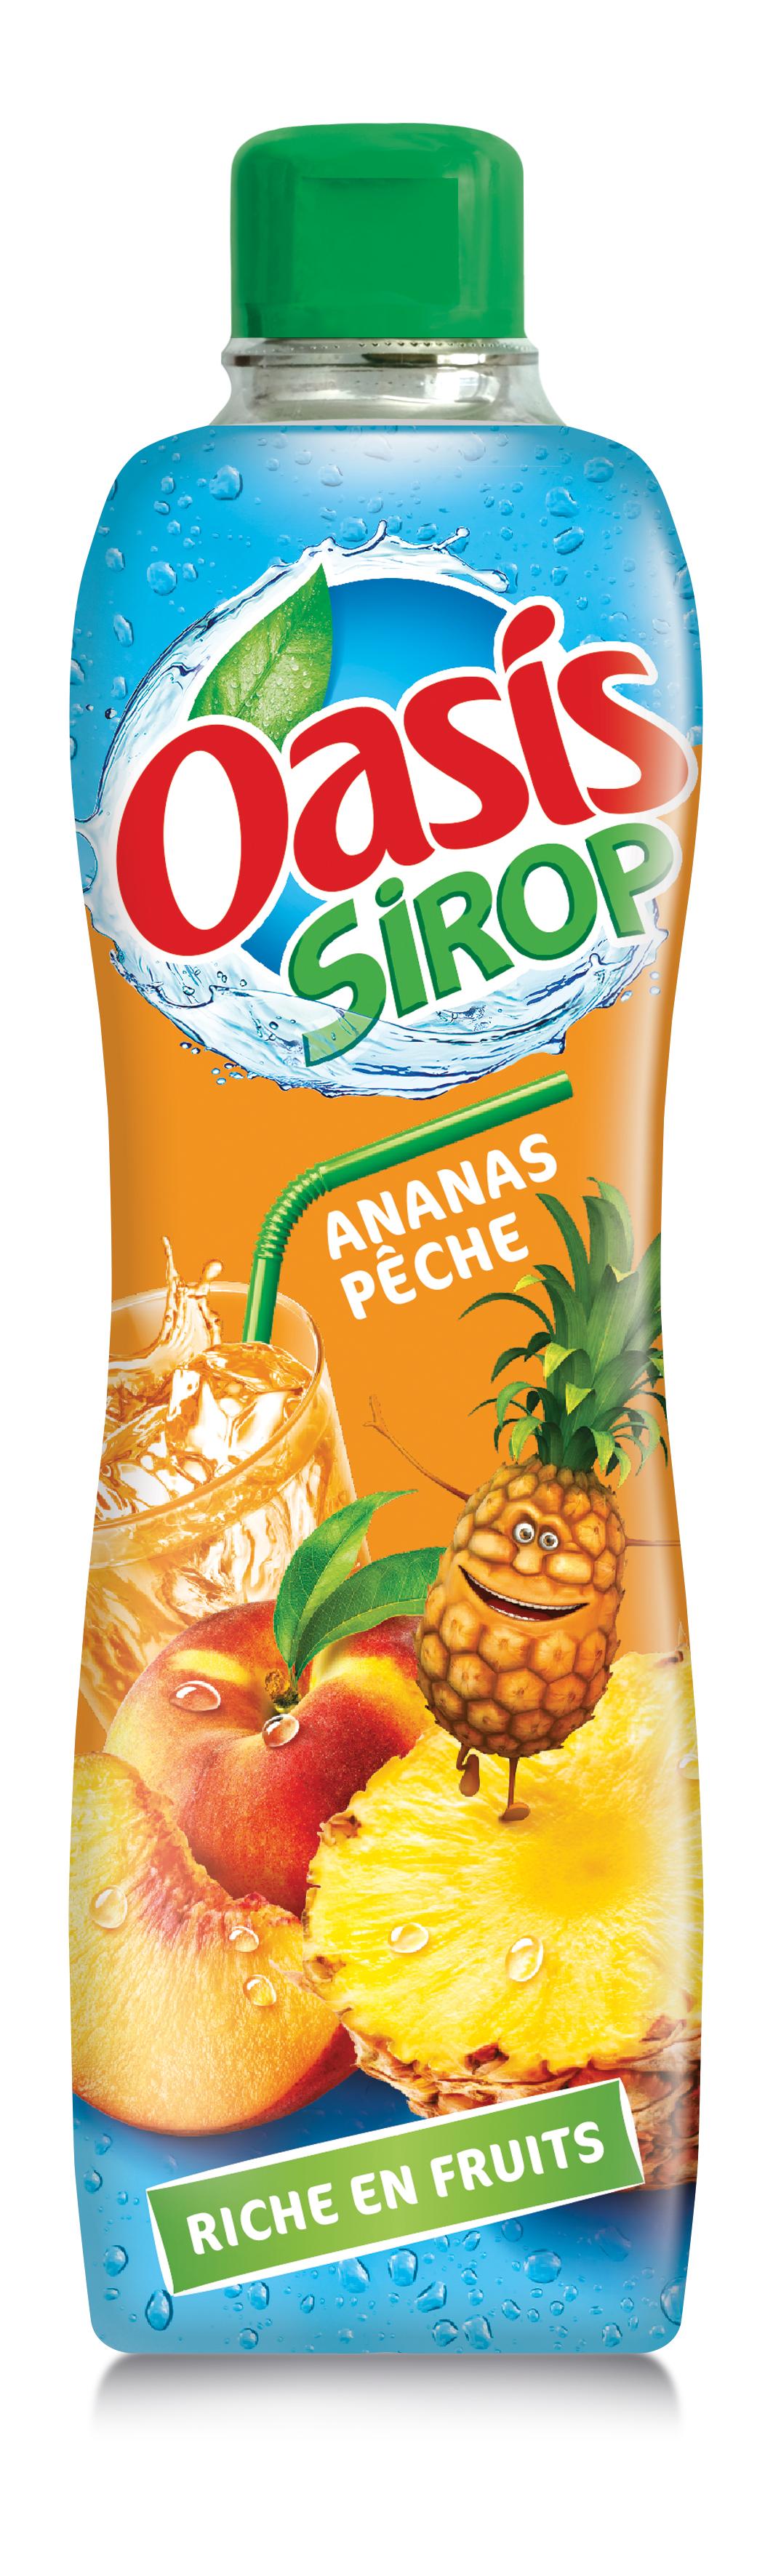 Ananas peche - Oasis lance sa première gamme de sirops